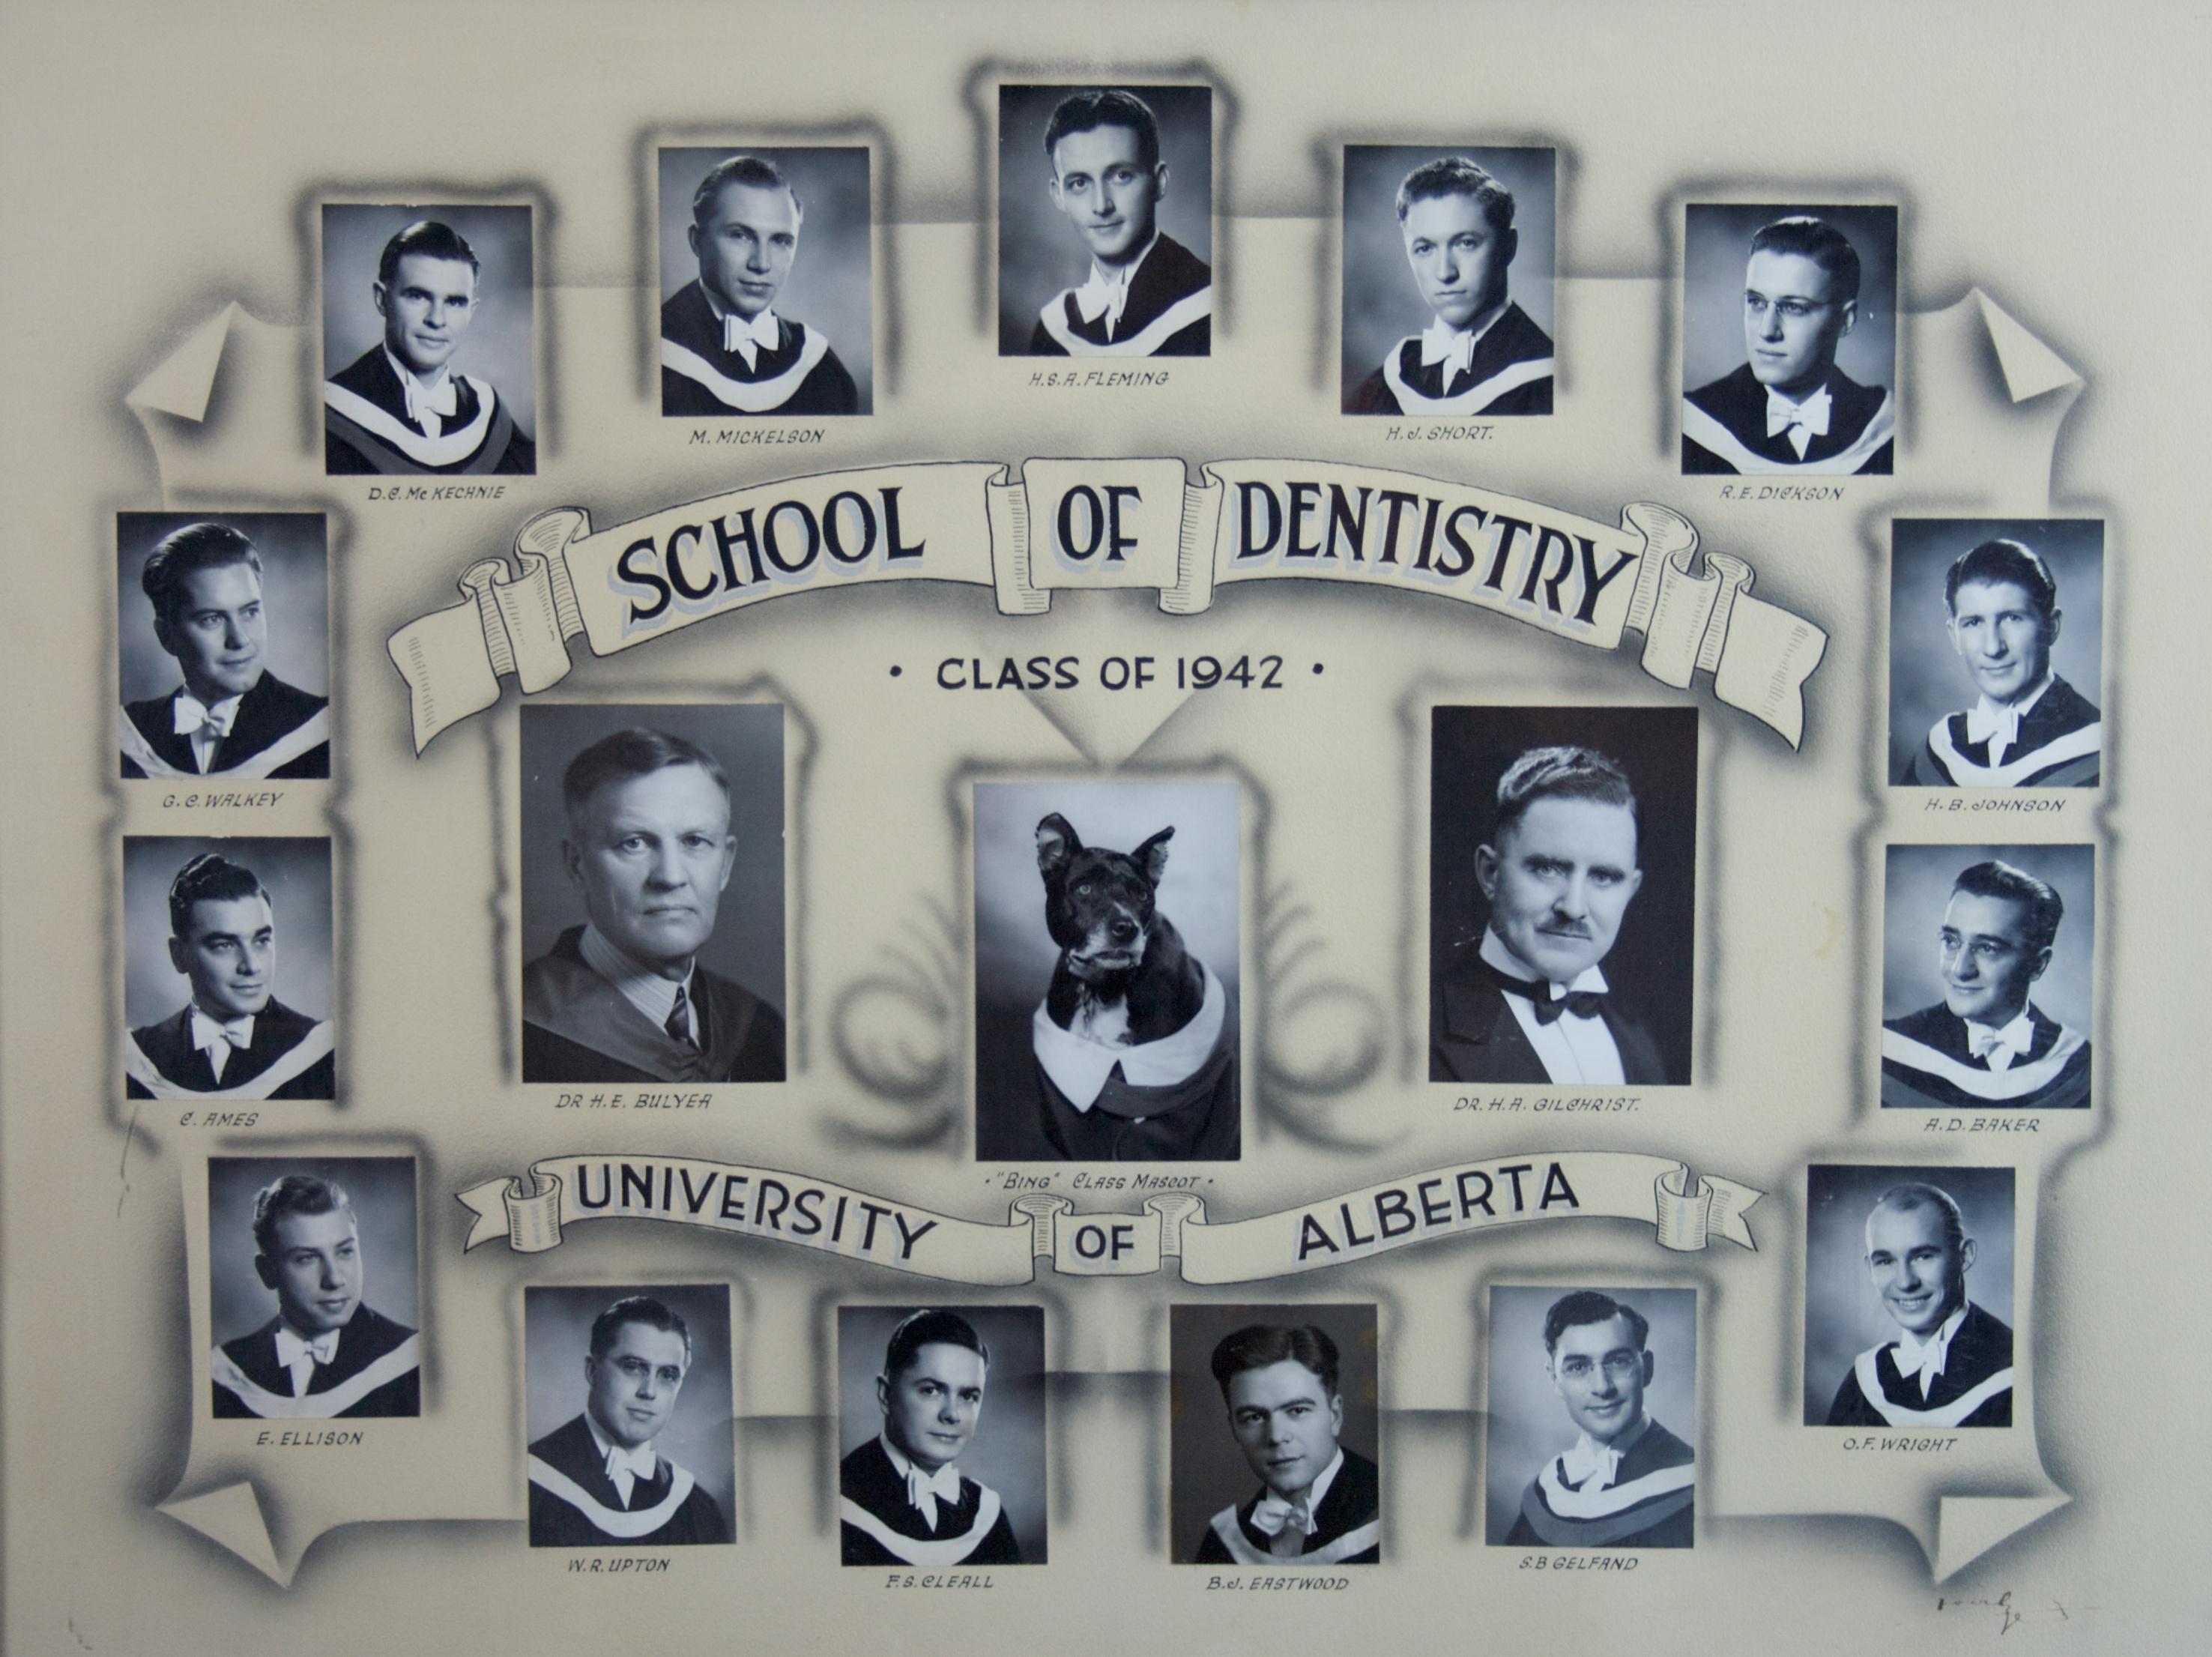 School of Dentistry Class of 1942